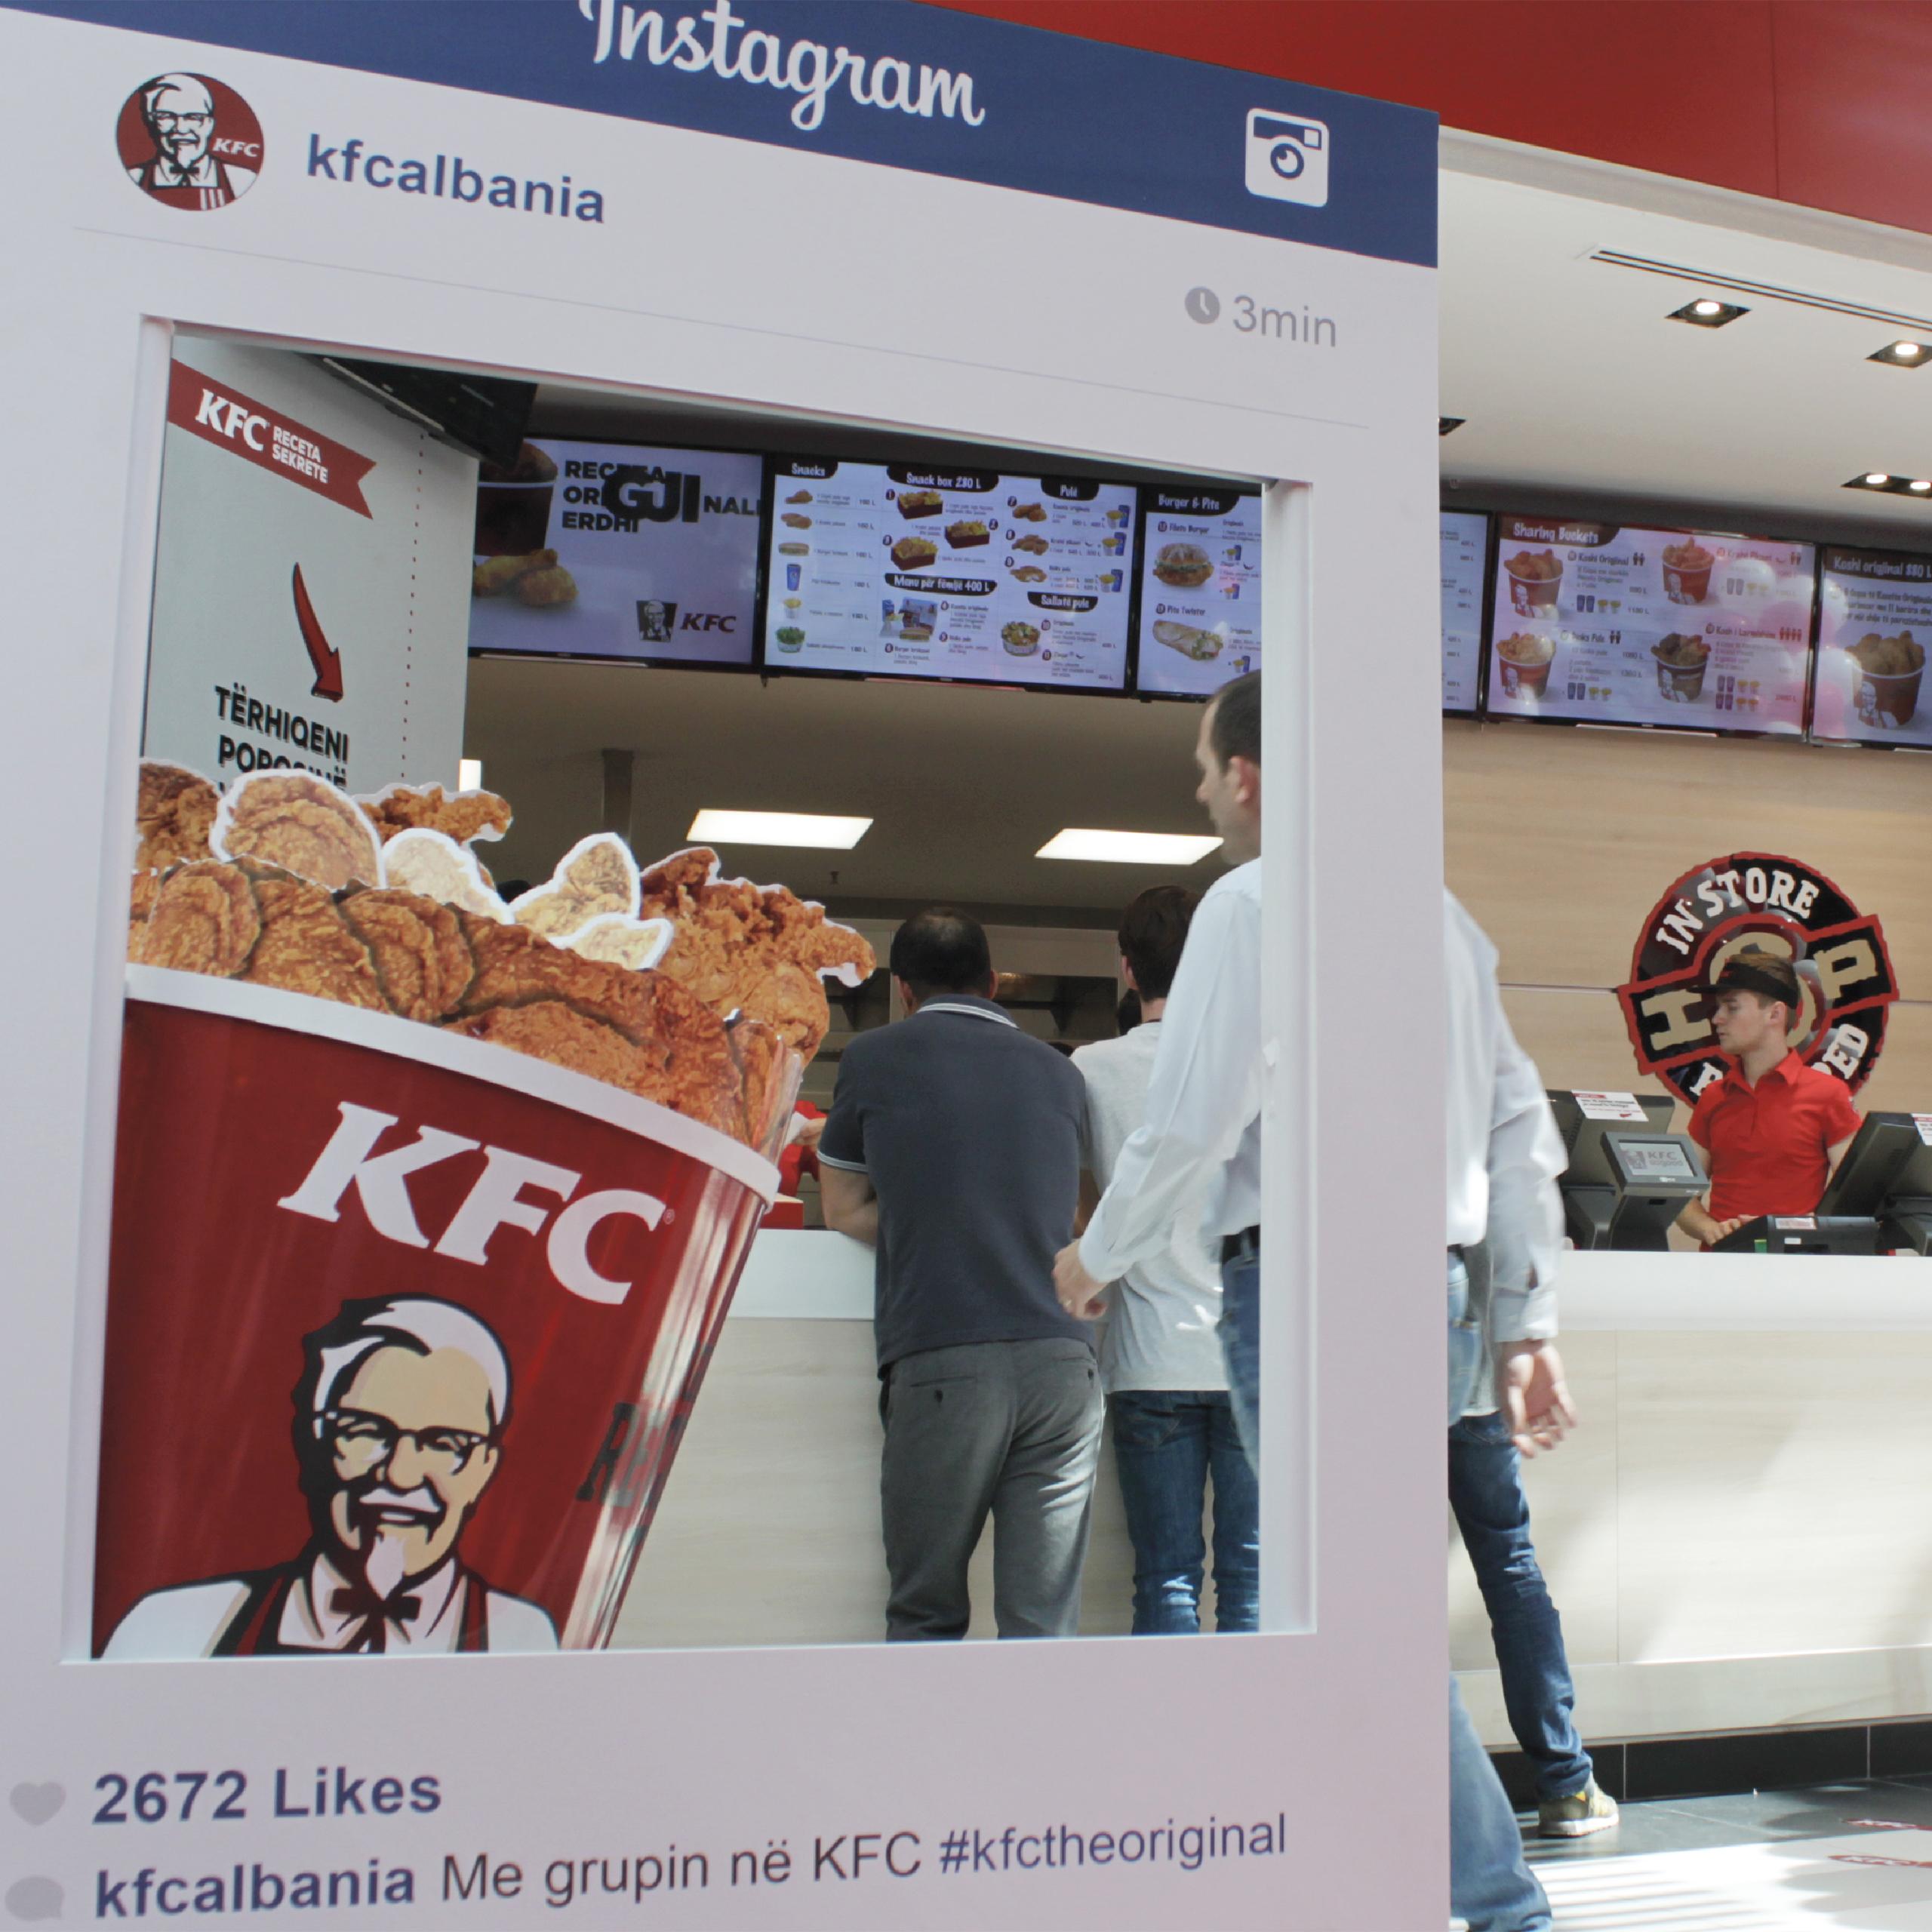 KFC, Social, Project Img 15 - Vatra Agency / Founder & CEO Gerton Bejo